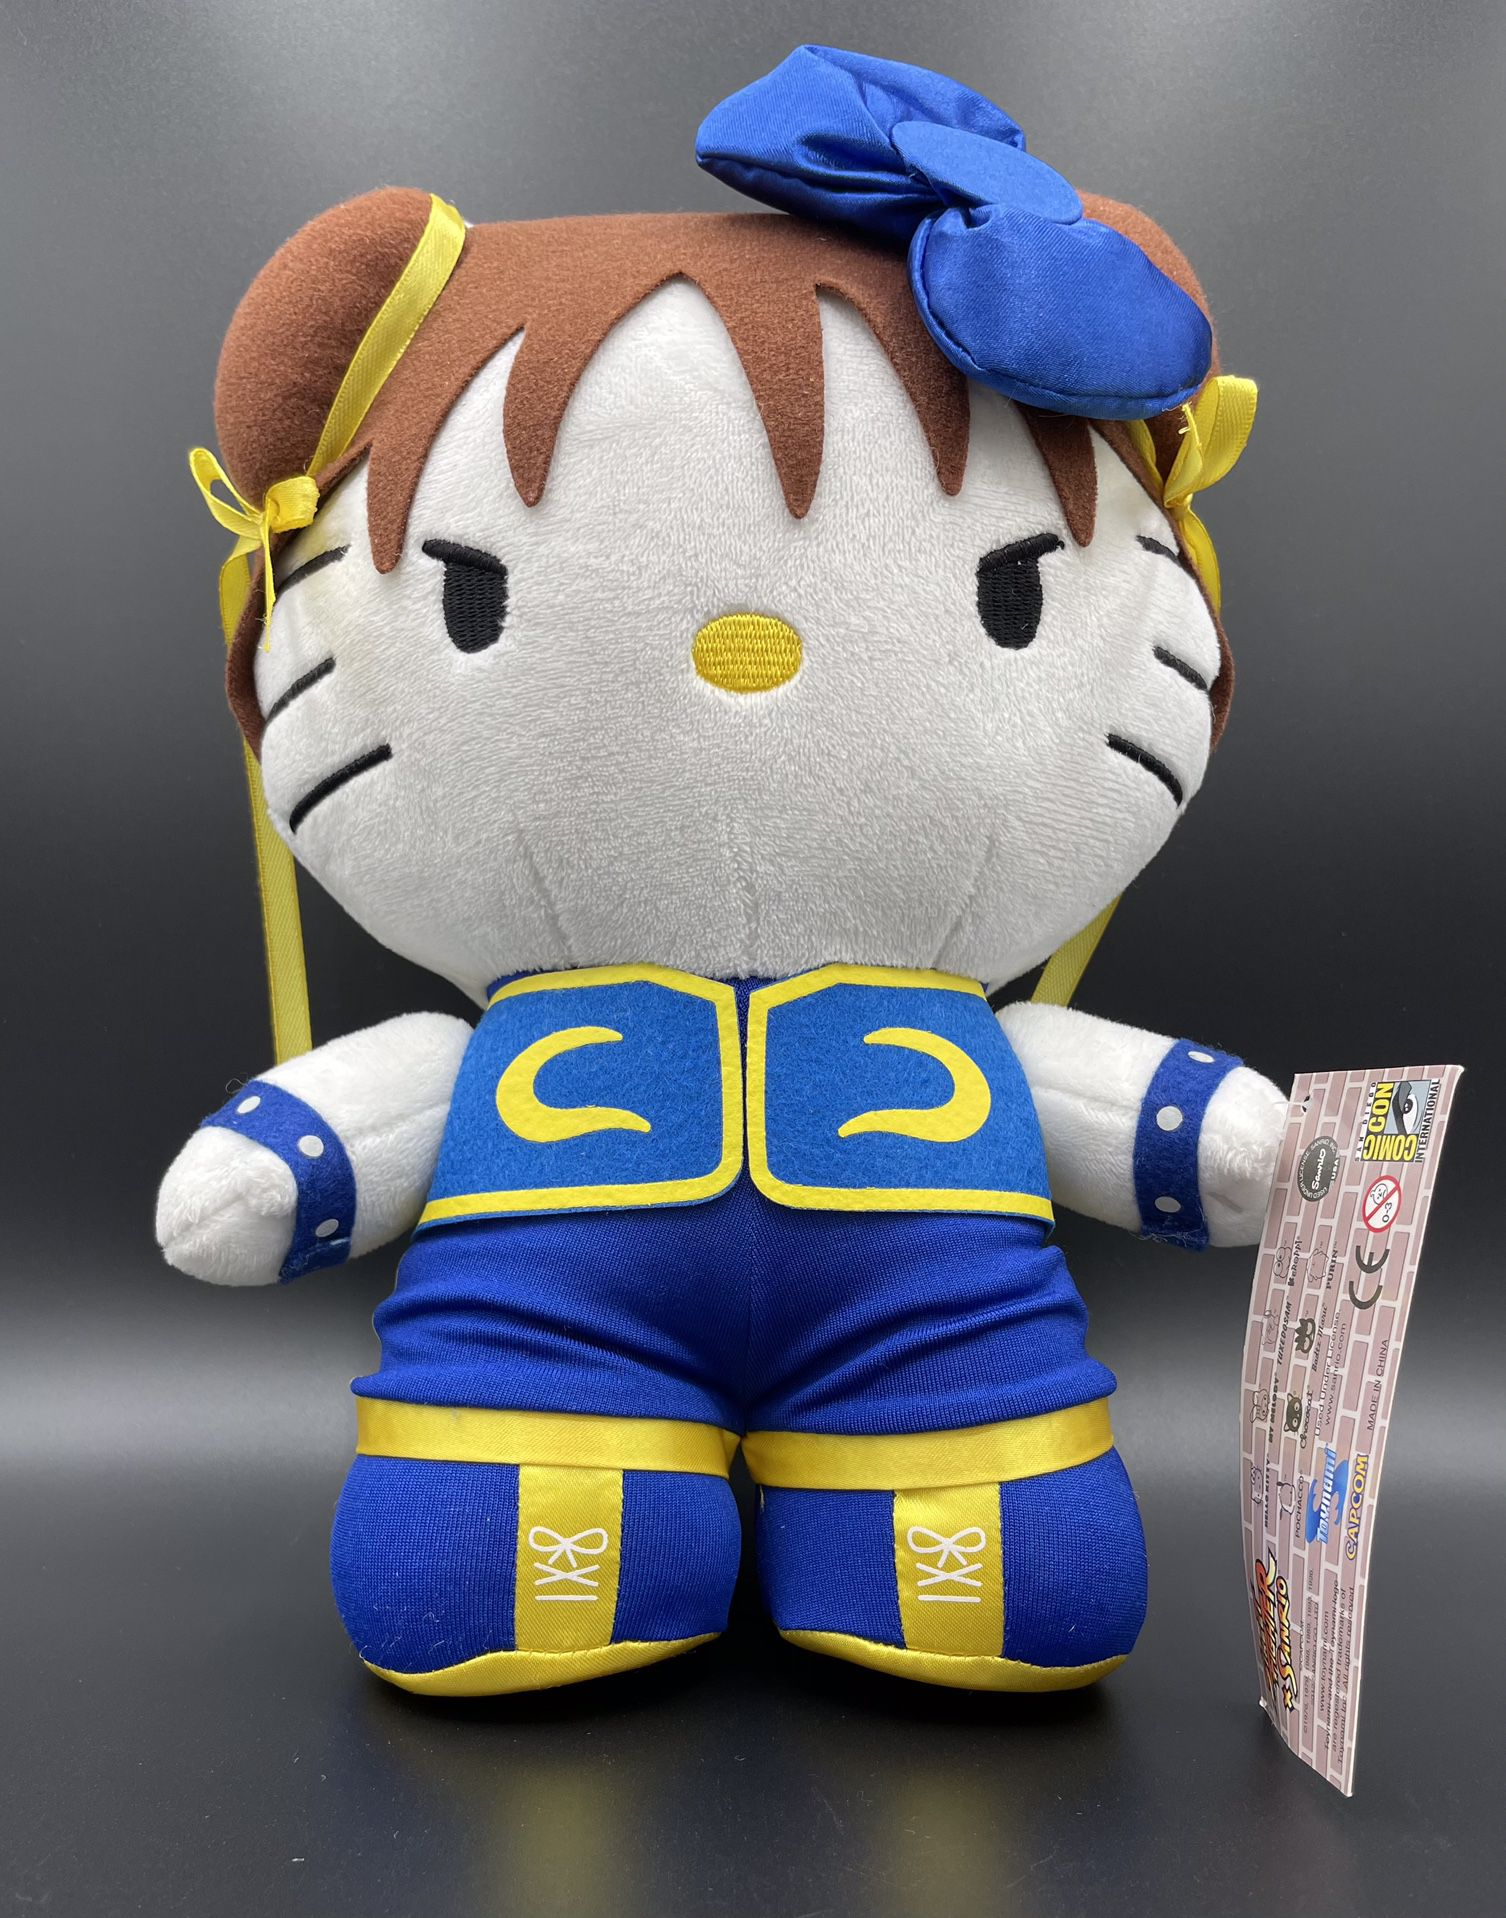 "Street Fighter X Sanrio Chun Li Plush Figure - 11"" Comic-con 2012 Capcom Exclusive - New With Tags"